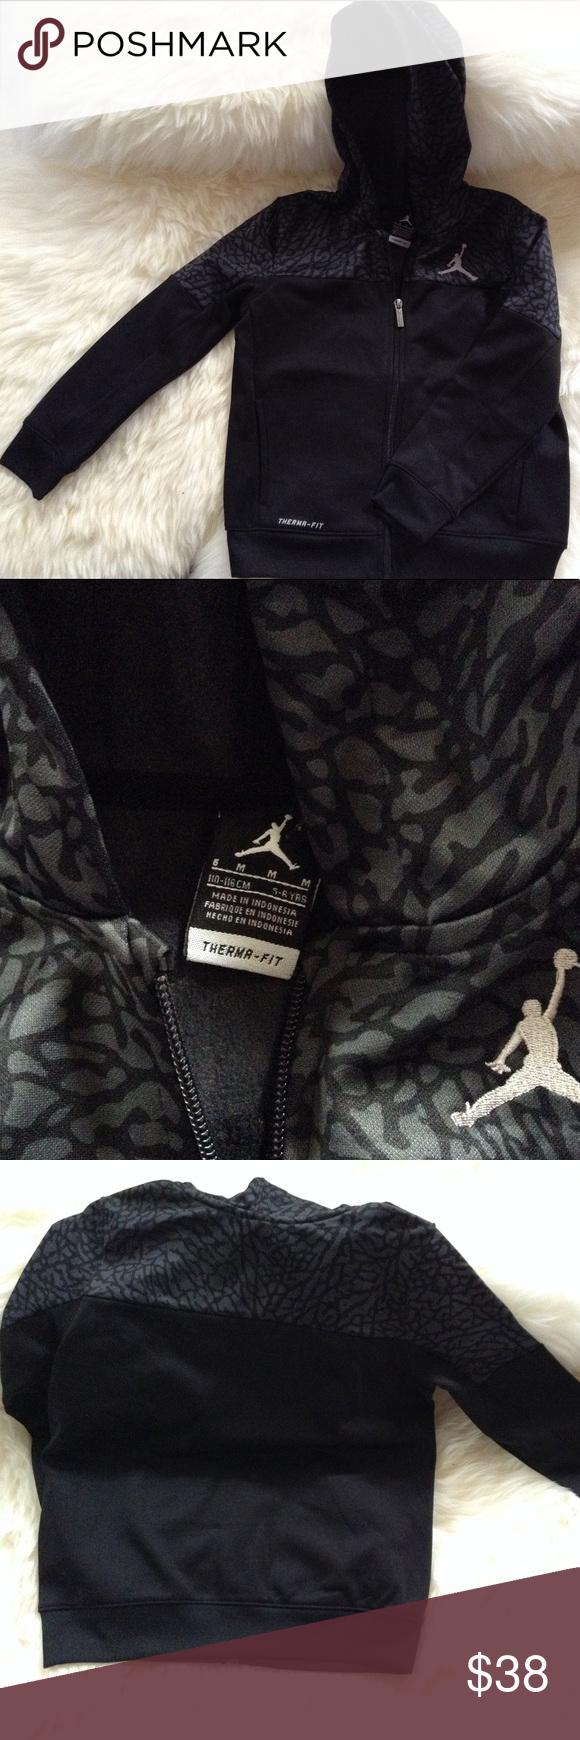 Host pick jordan jacket for boys size nwot